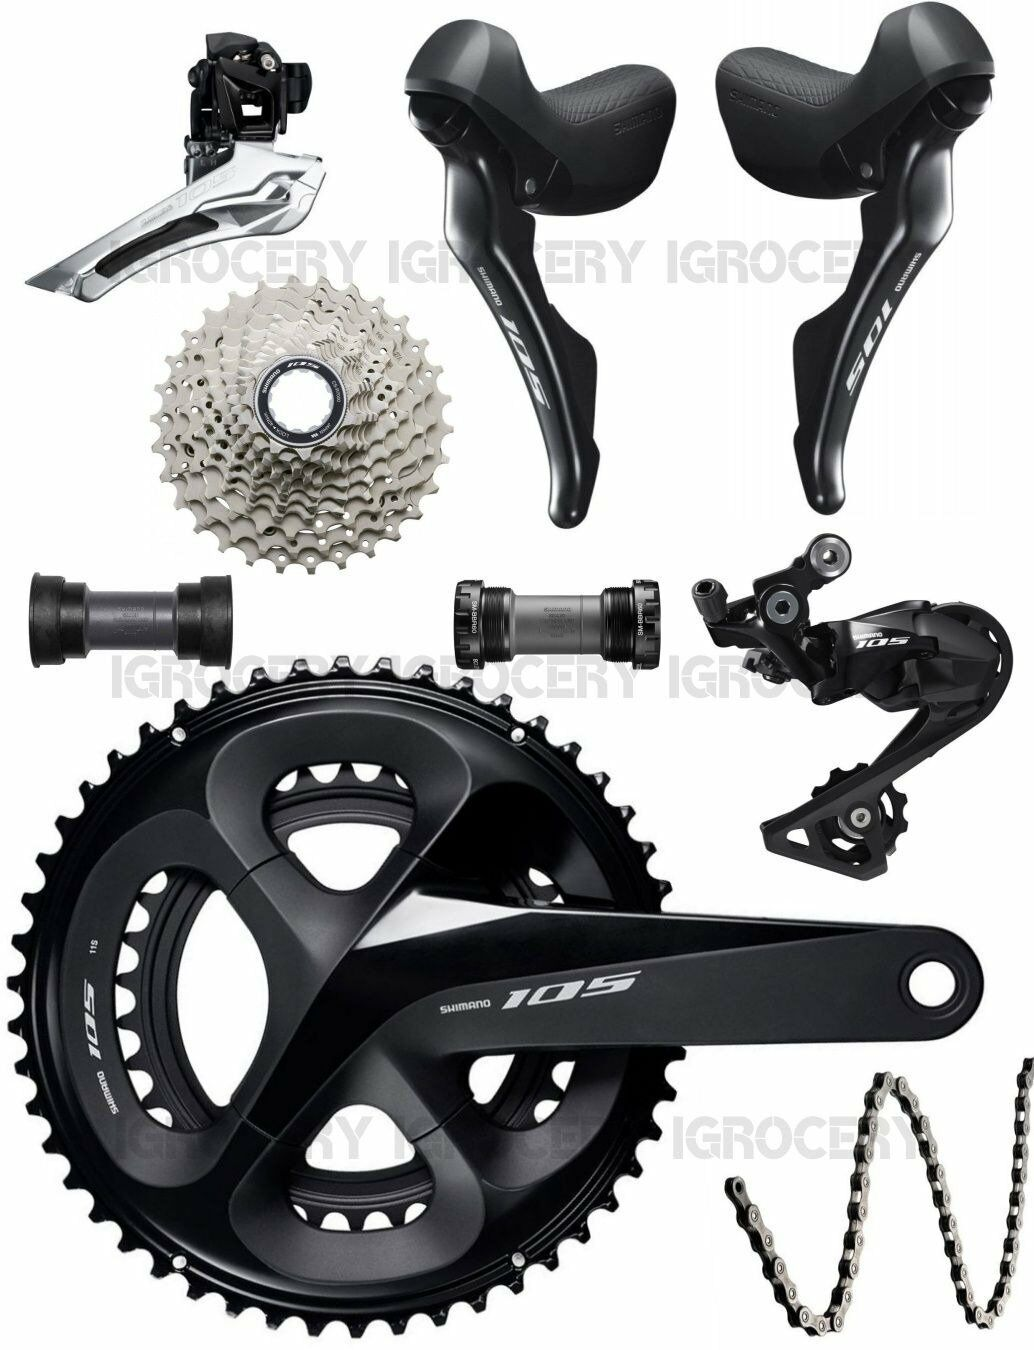 Shimano 105 R7000 Groupset 2x11-speed Road Bike 7Pcs Mechanical New (52 36T SS)